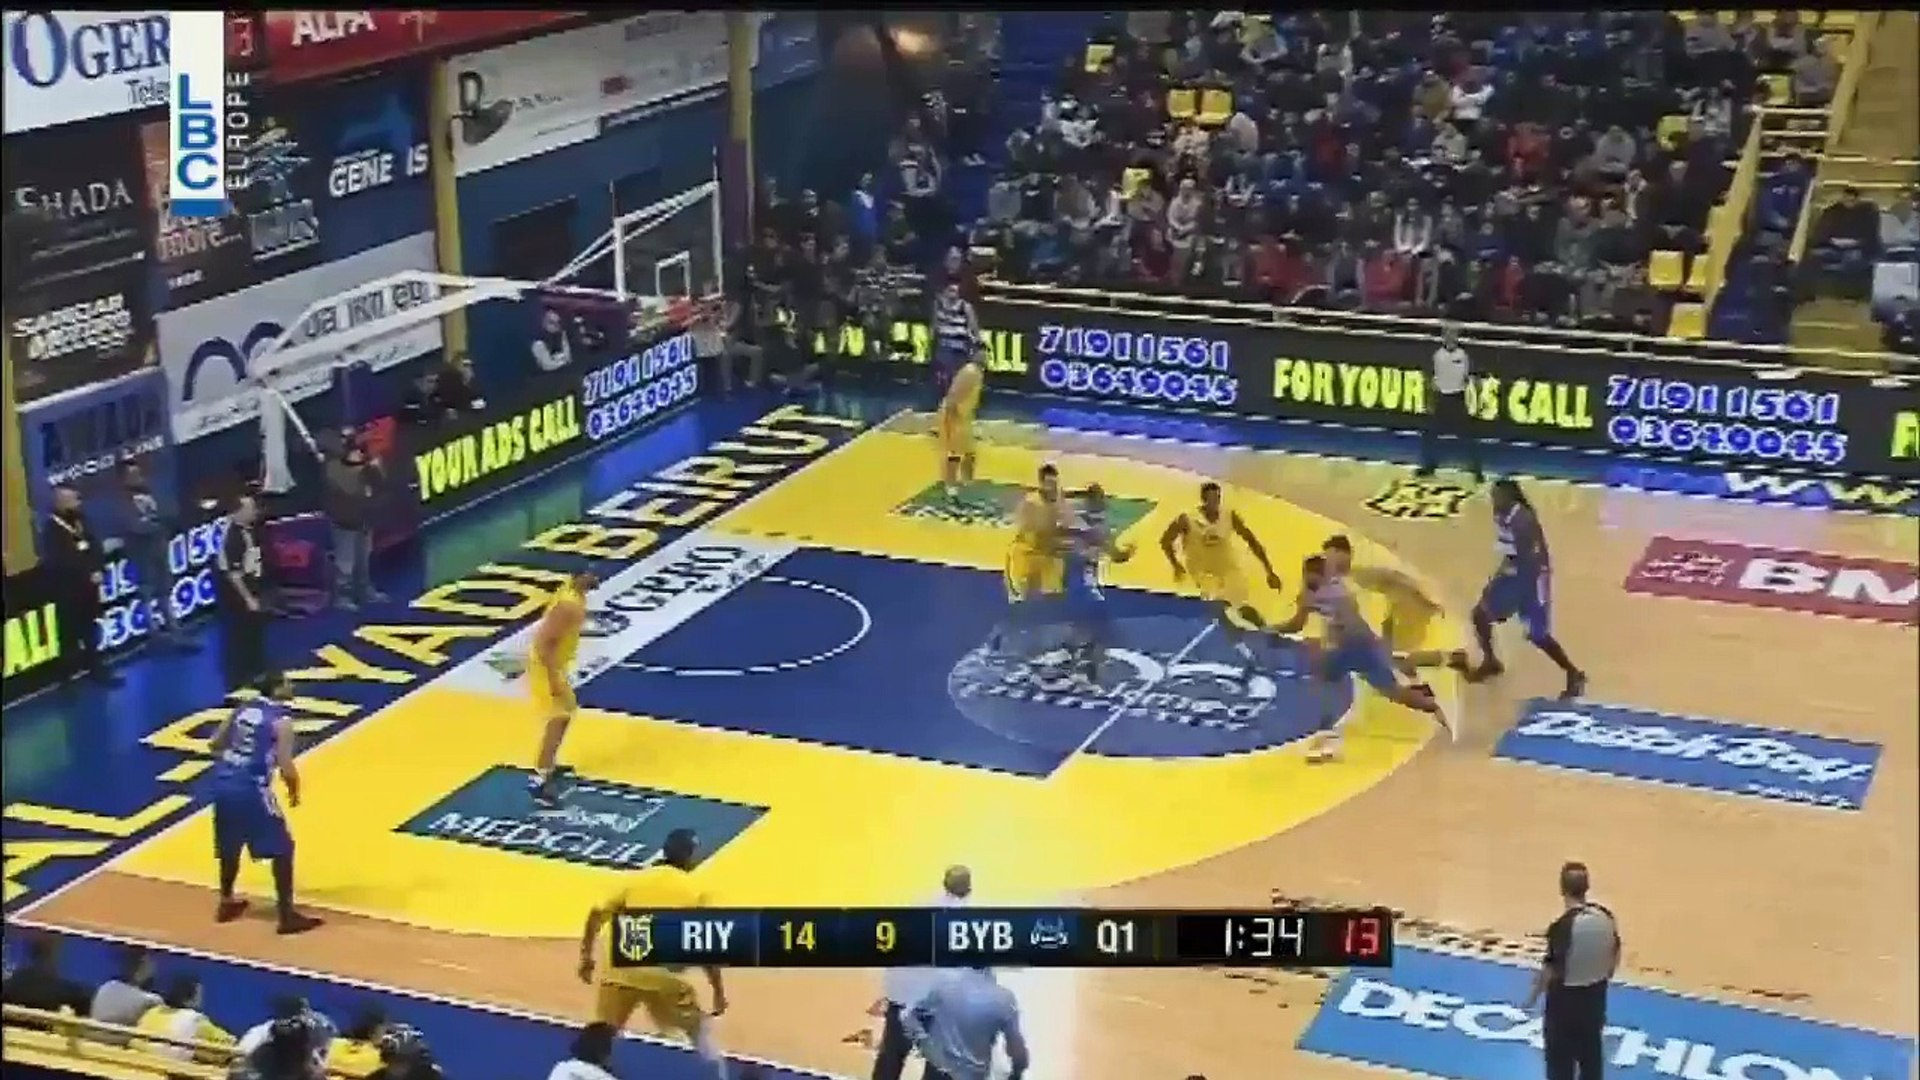 Lebanese Basketball League 2016/2017 Jay Youngblood Dunk